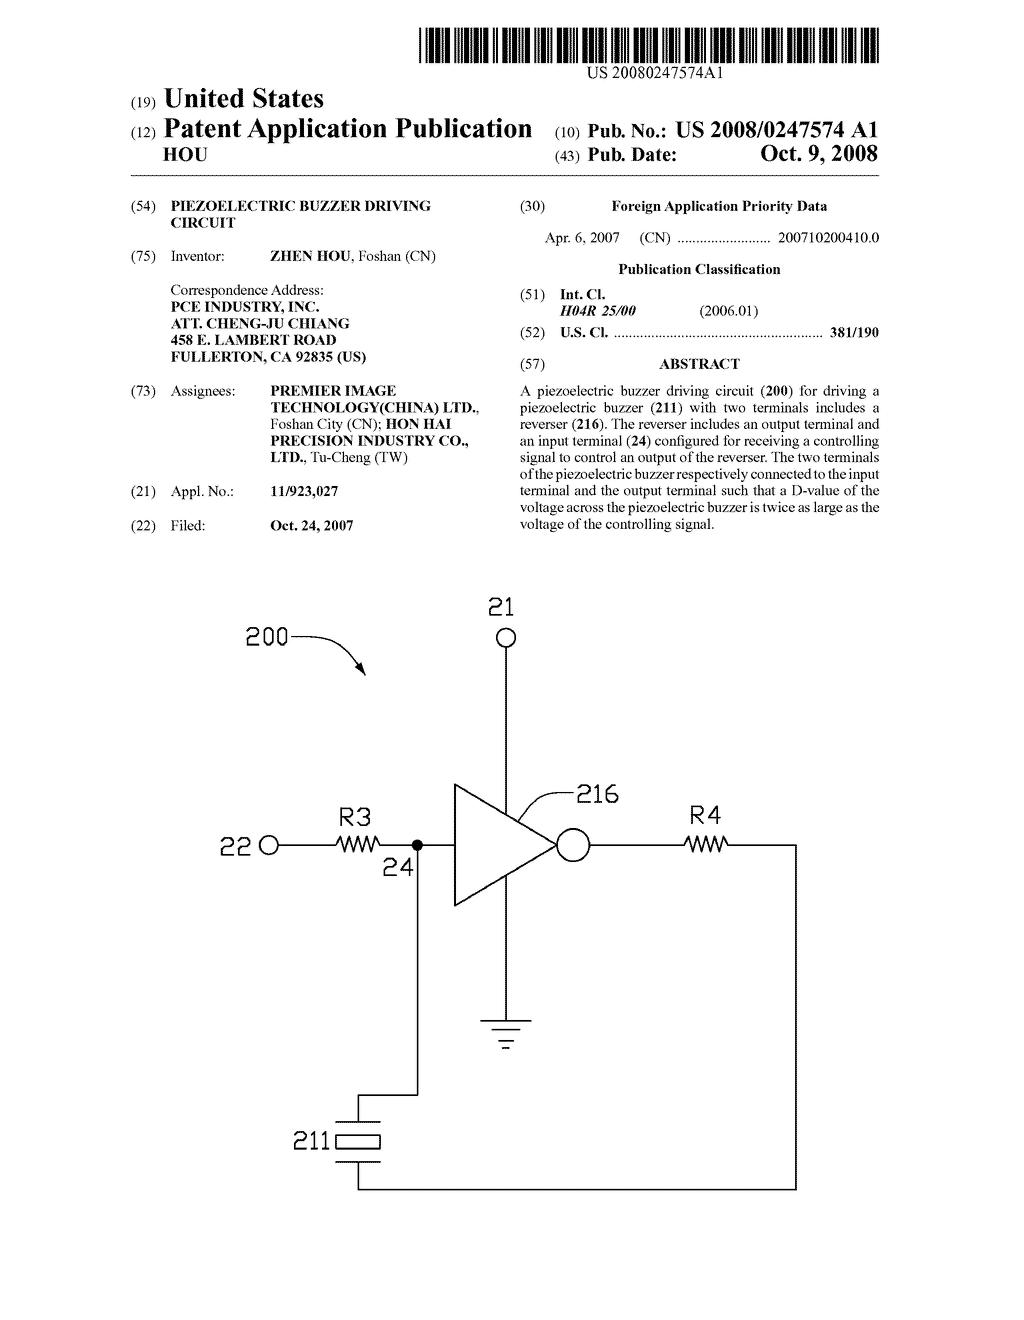 PIEZOELECTRIC BUZZER DRIVING CIRCUIT - diagram, schematic, and image 01